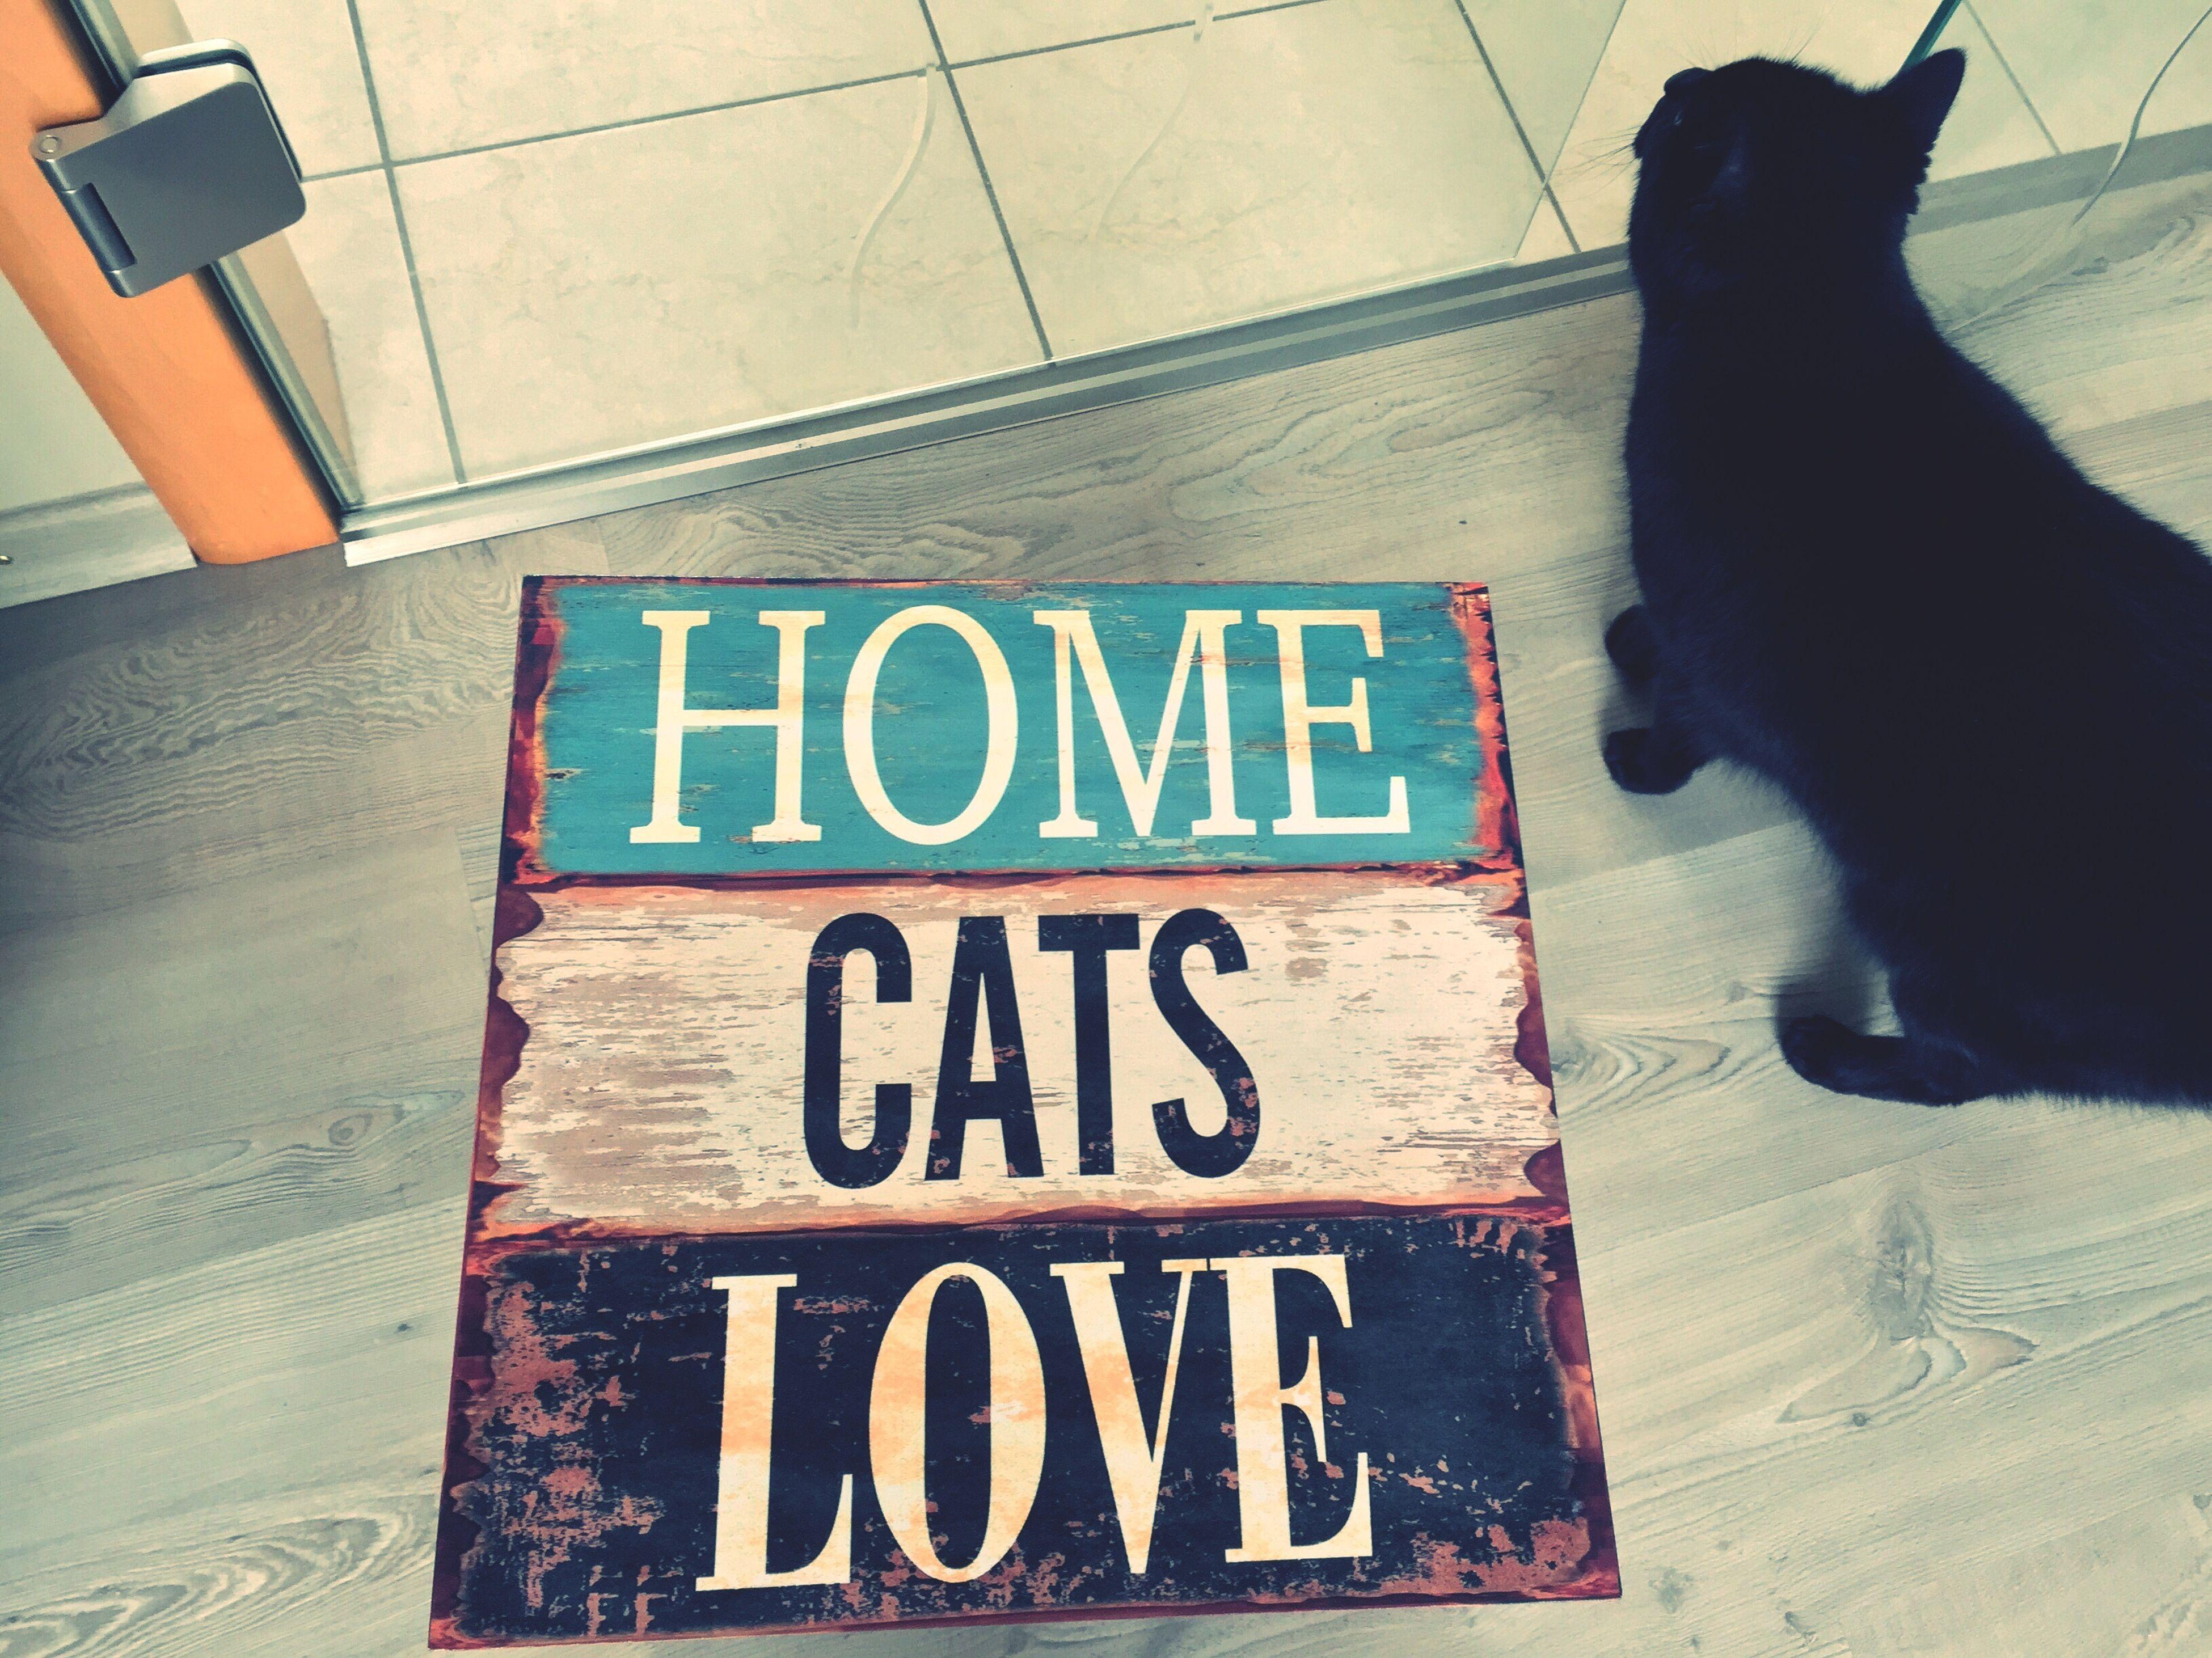 Home Cats Love 🏠😺💜 Cats 🐱 Cats Cat Lovers Cat Lover Cat Love Katzenliebe Katze Katzen 💜 Katzen Cat House Katzenhaus Domestic Cat Hauskatze Iphonegraphy Hobbyphotography Hobbyfotograf Tiere♡ Animals🐾